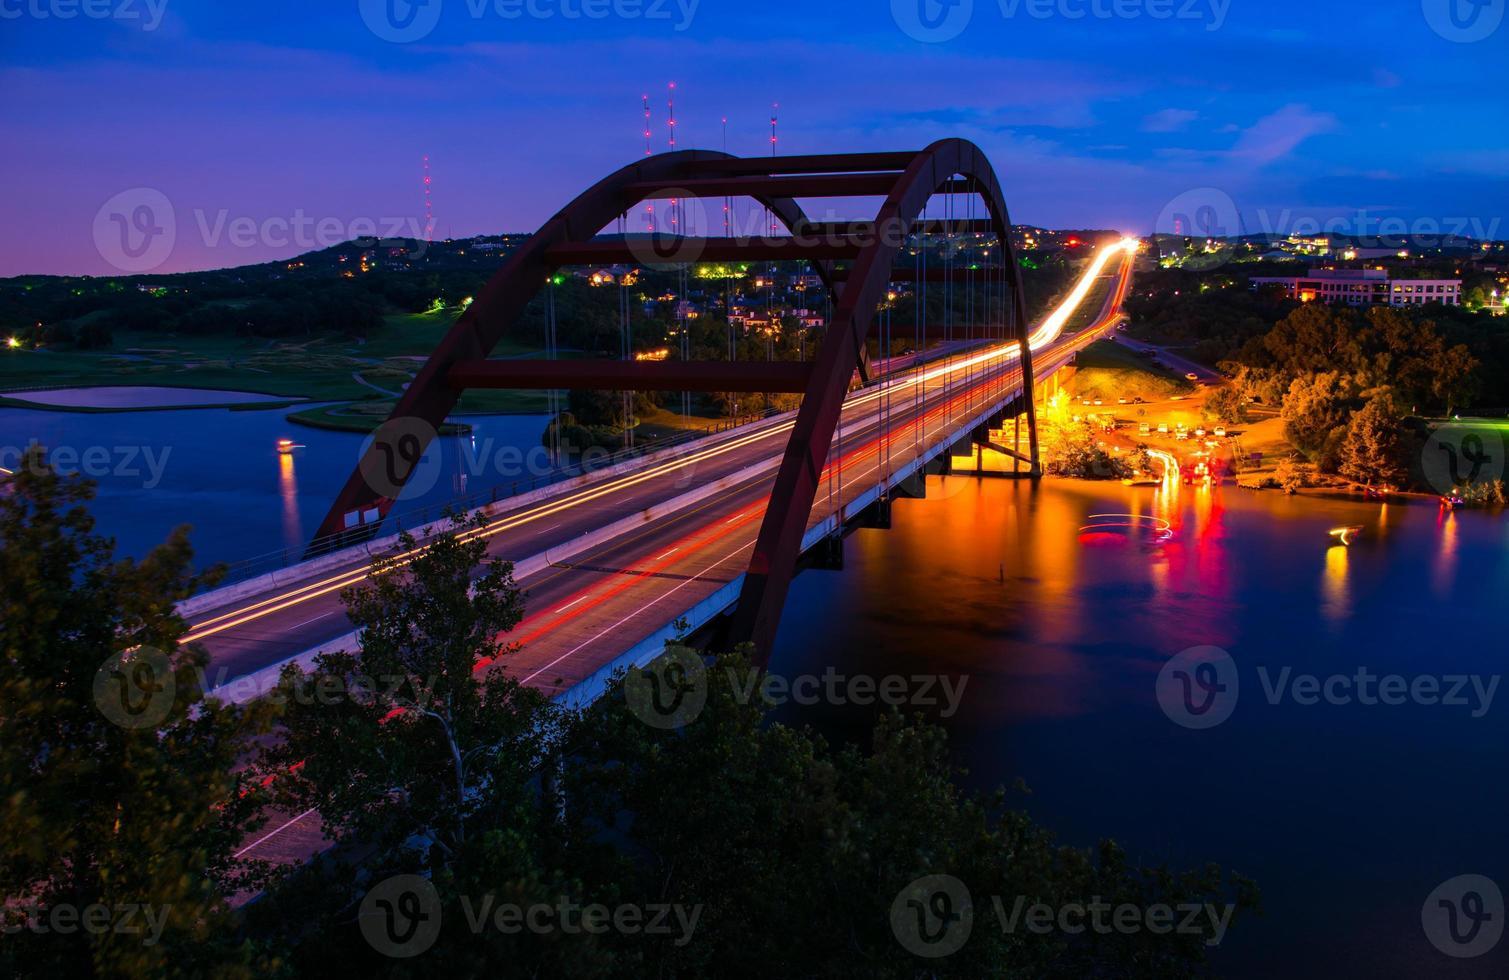 Pennybacker Loop 360 Brücke Nacht Schuss Kreis Lichter Austin Texas foto